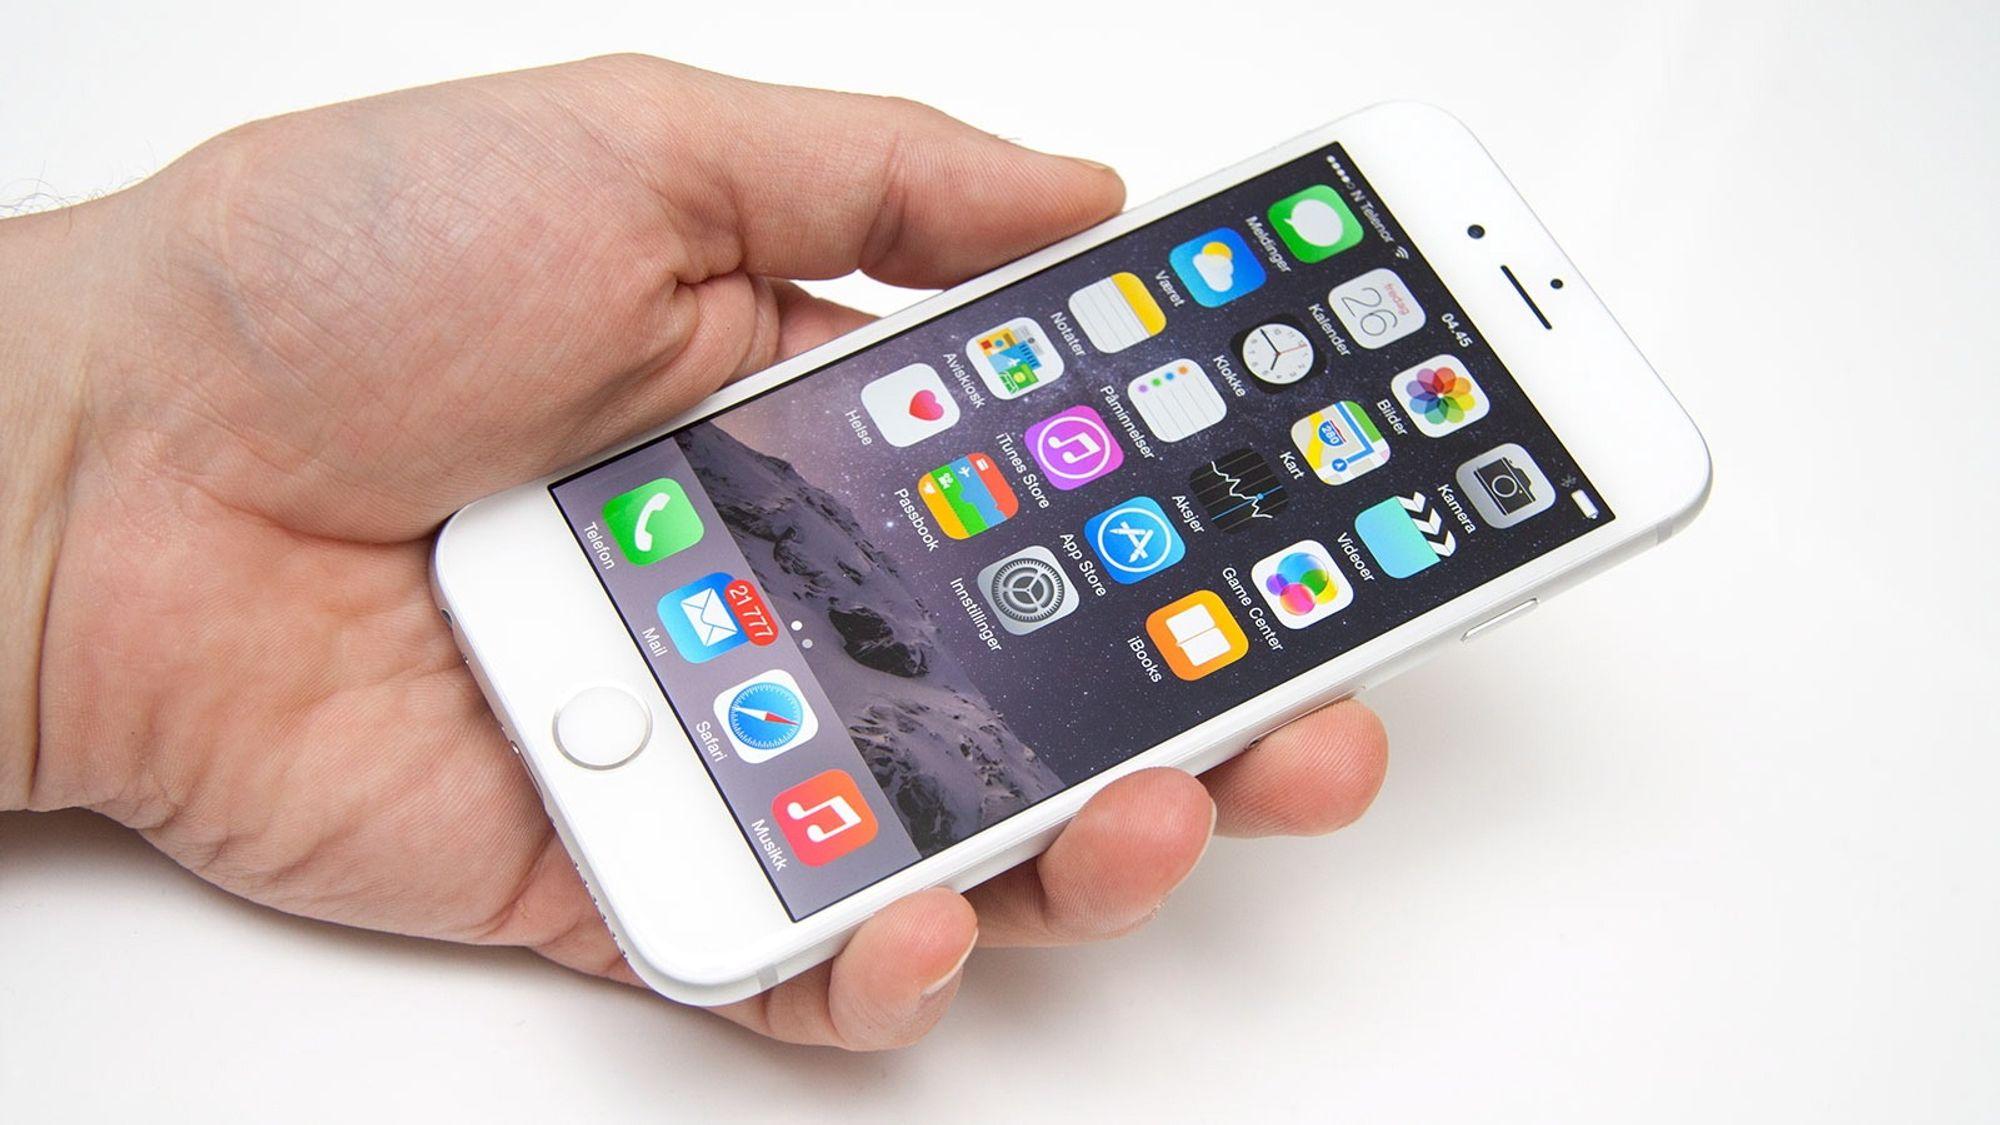 Billig iPhone!? Ja, det er mulig | MyTrendyPhone Blog